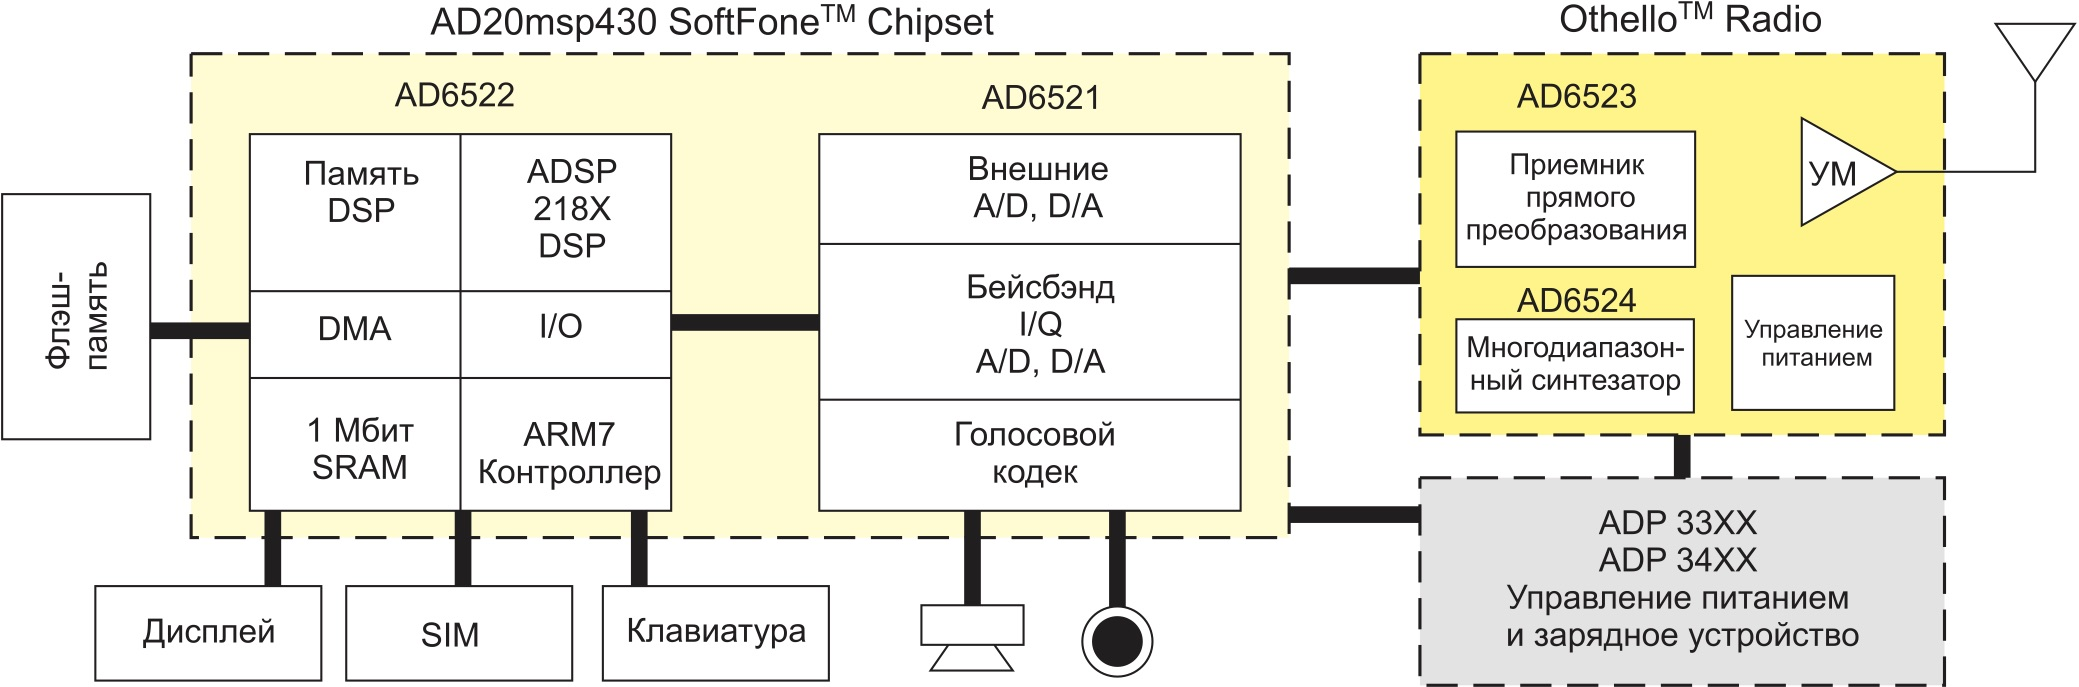 Блок-схема мобильного терминала AD20msp430/Othello